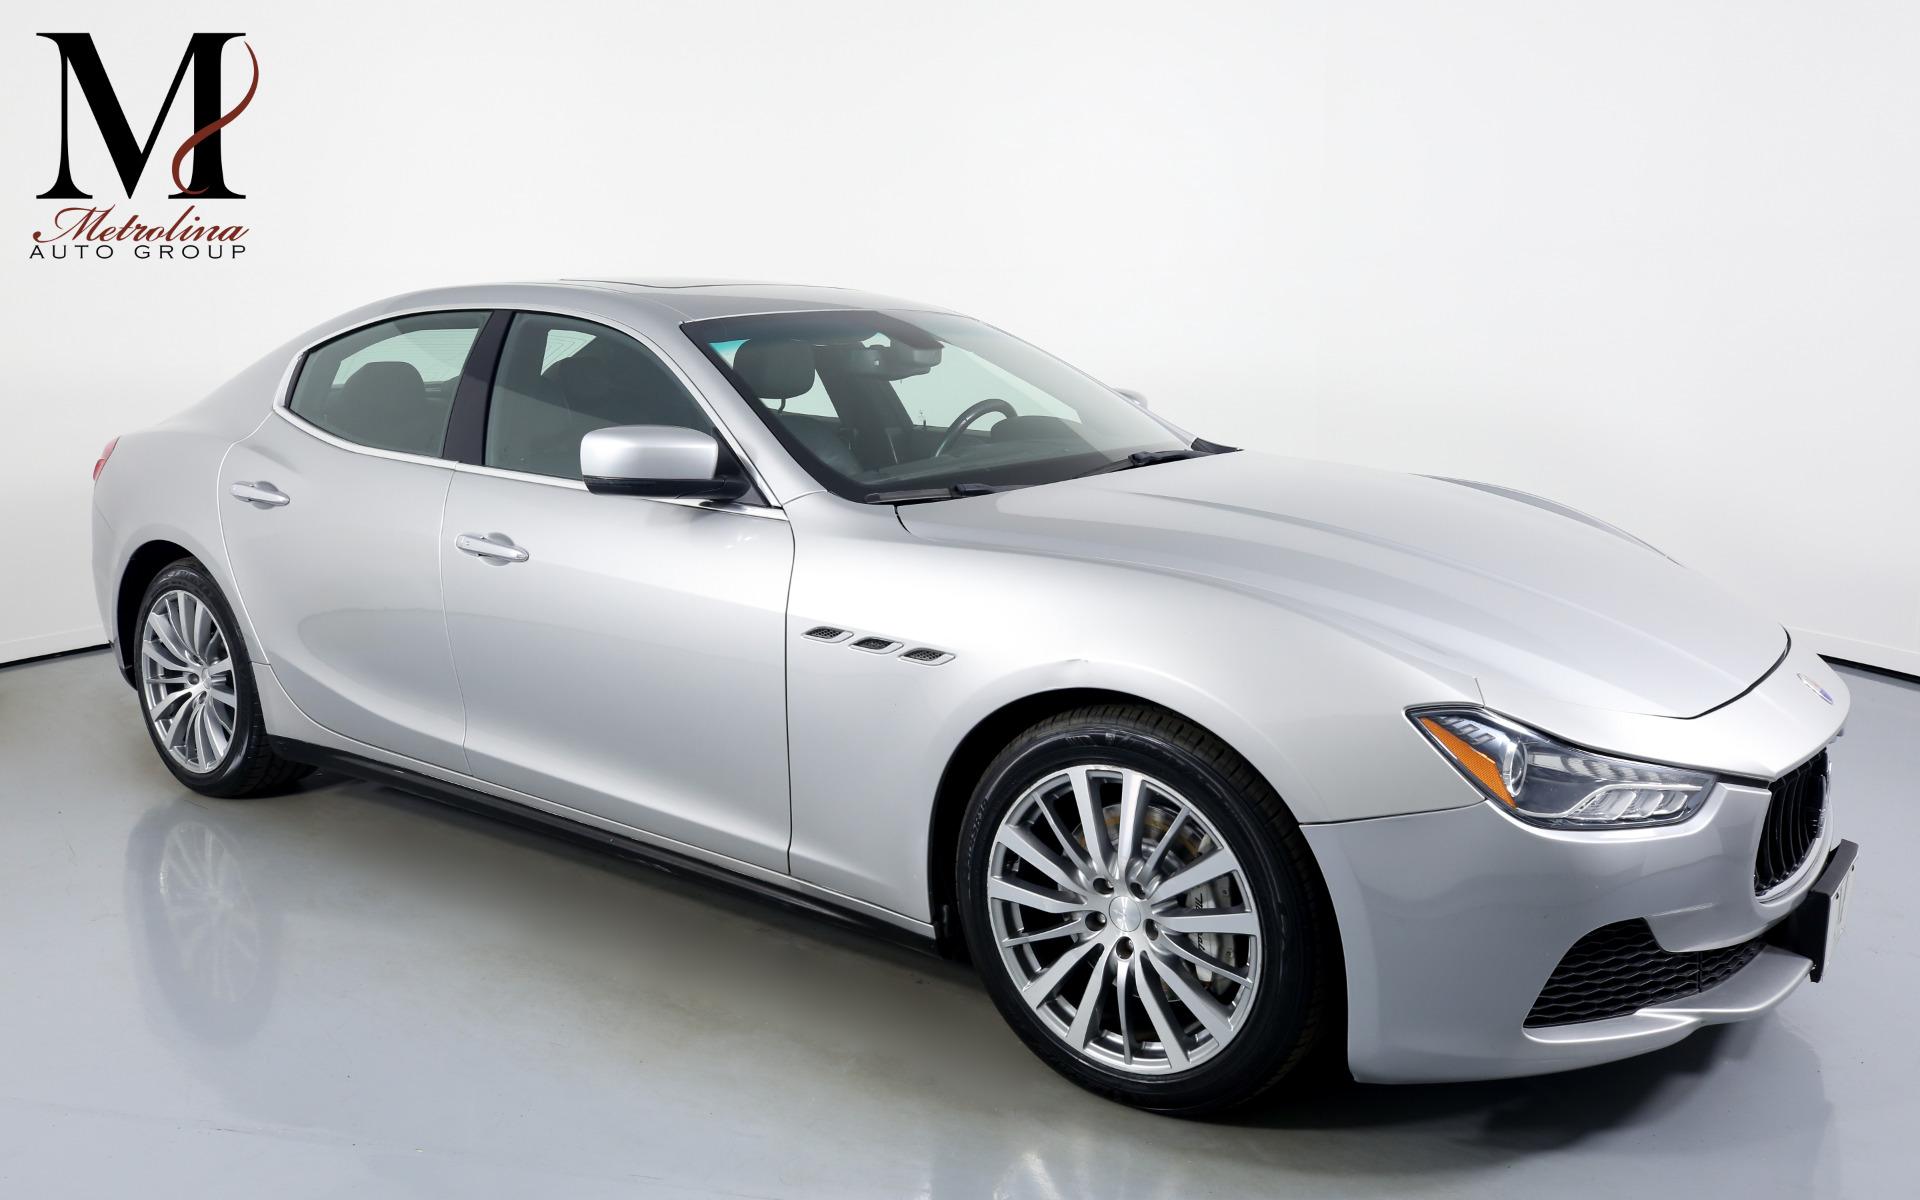 Used 2014 Maserati Ghibli for sale $25,996 at Metrolina Auto Group in Charlotte NC 28217 - 1